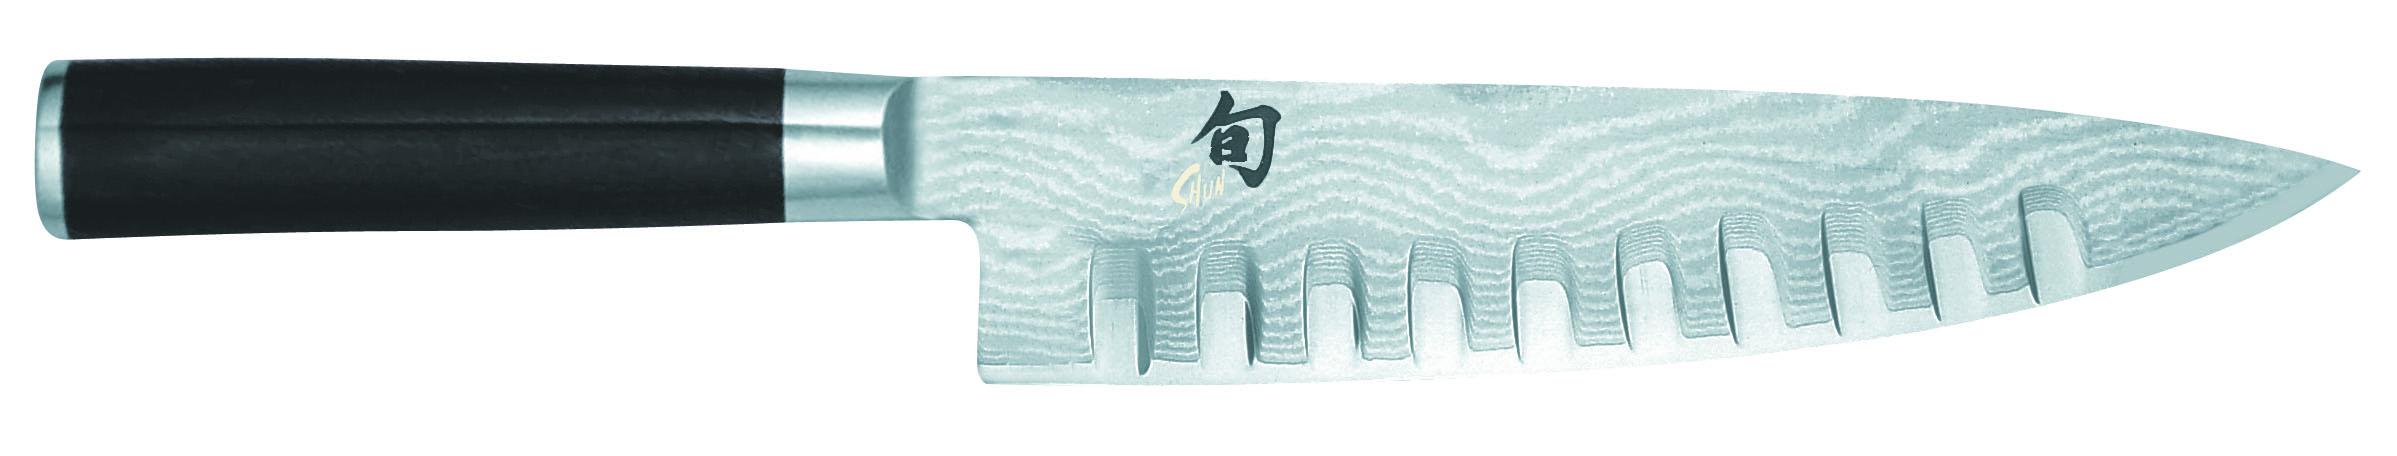 Kai Shun Classic DM-0719 Kockkniv Olivslipad 205 cm